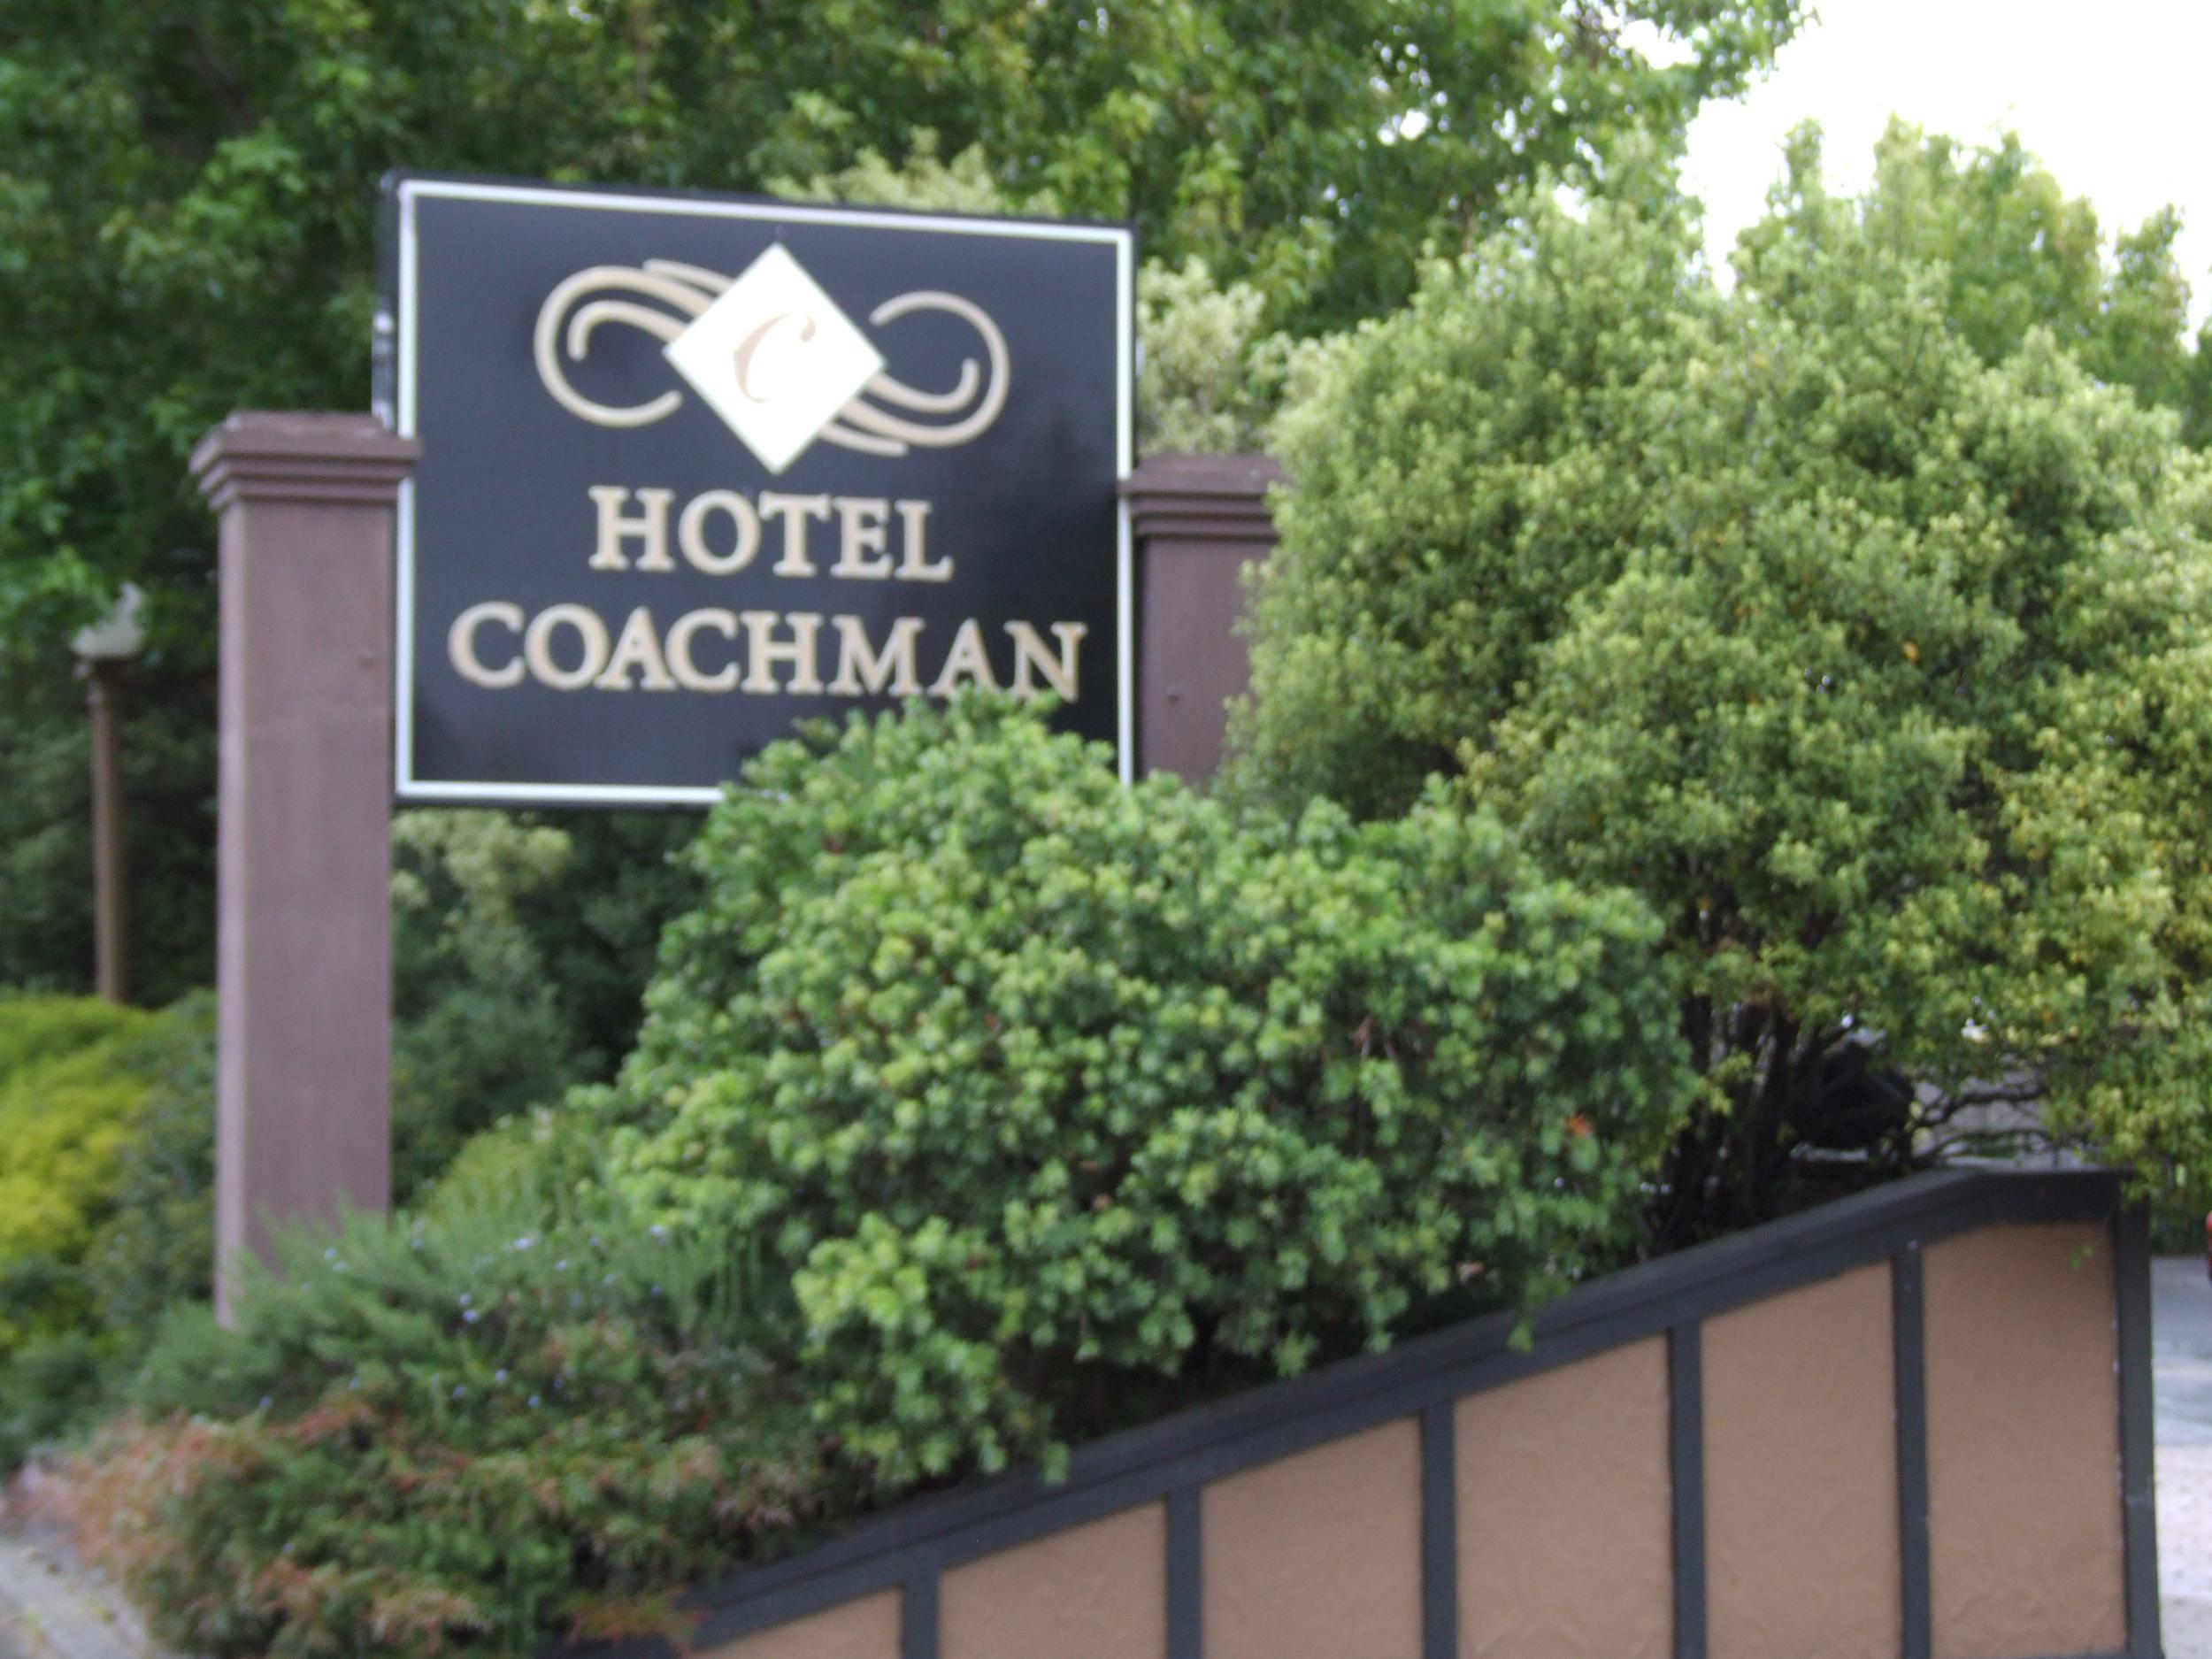 Hotel Coachman Exterior 3.jpg